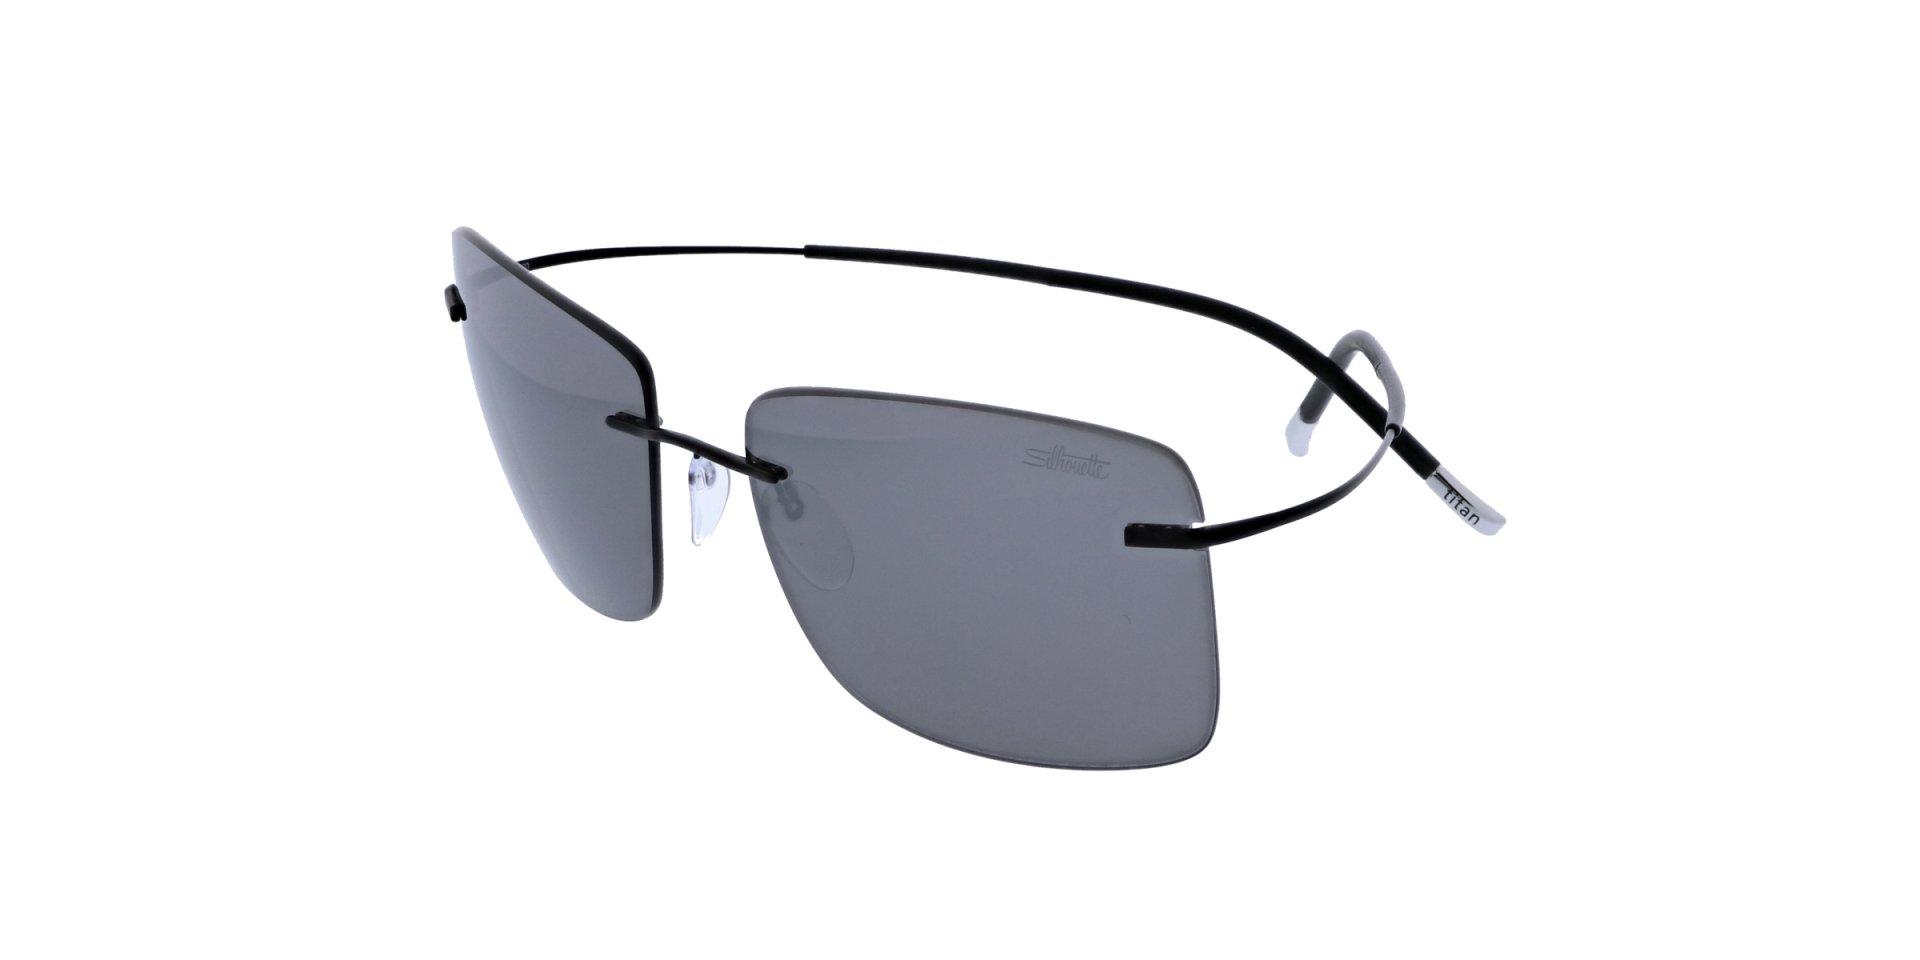 9ec22384b5e Silhouette Polarized Sunglasses « One More Soul